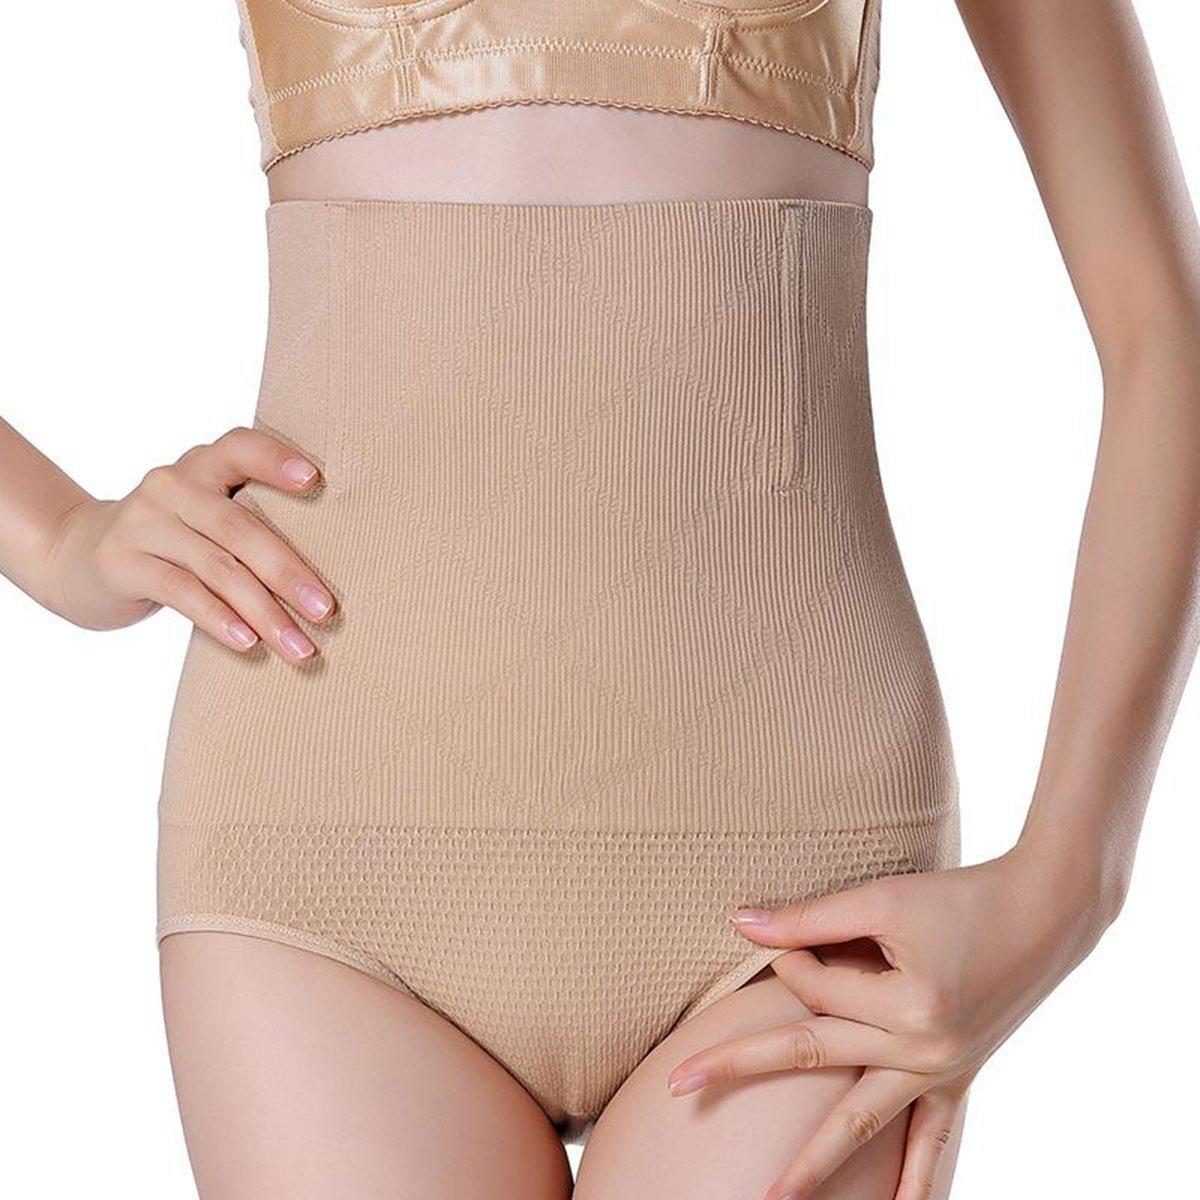 97eefe56d1b Miracle Women High Waist Panties Seamless Tummy Control Butt Lifting Body  Shapewear at Amazon Women s Clothing store